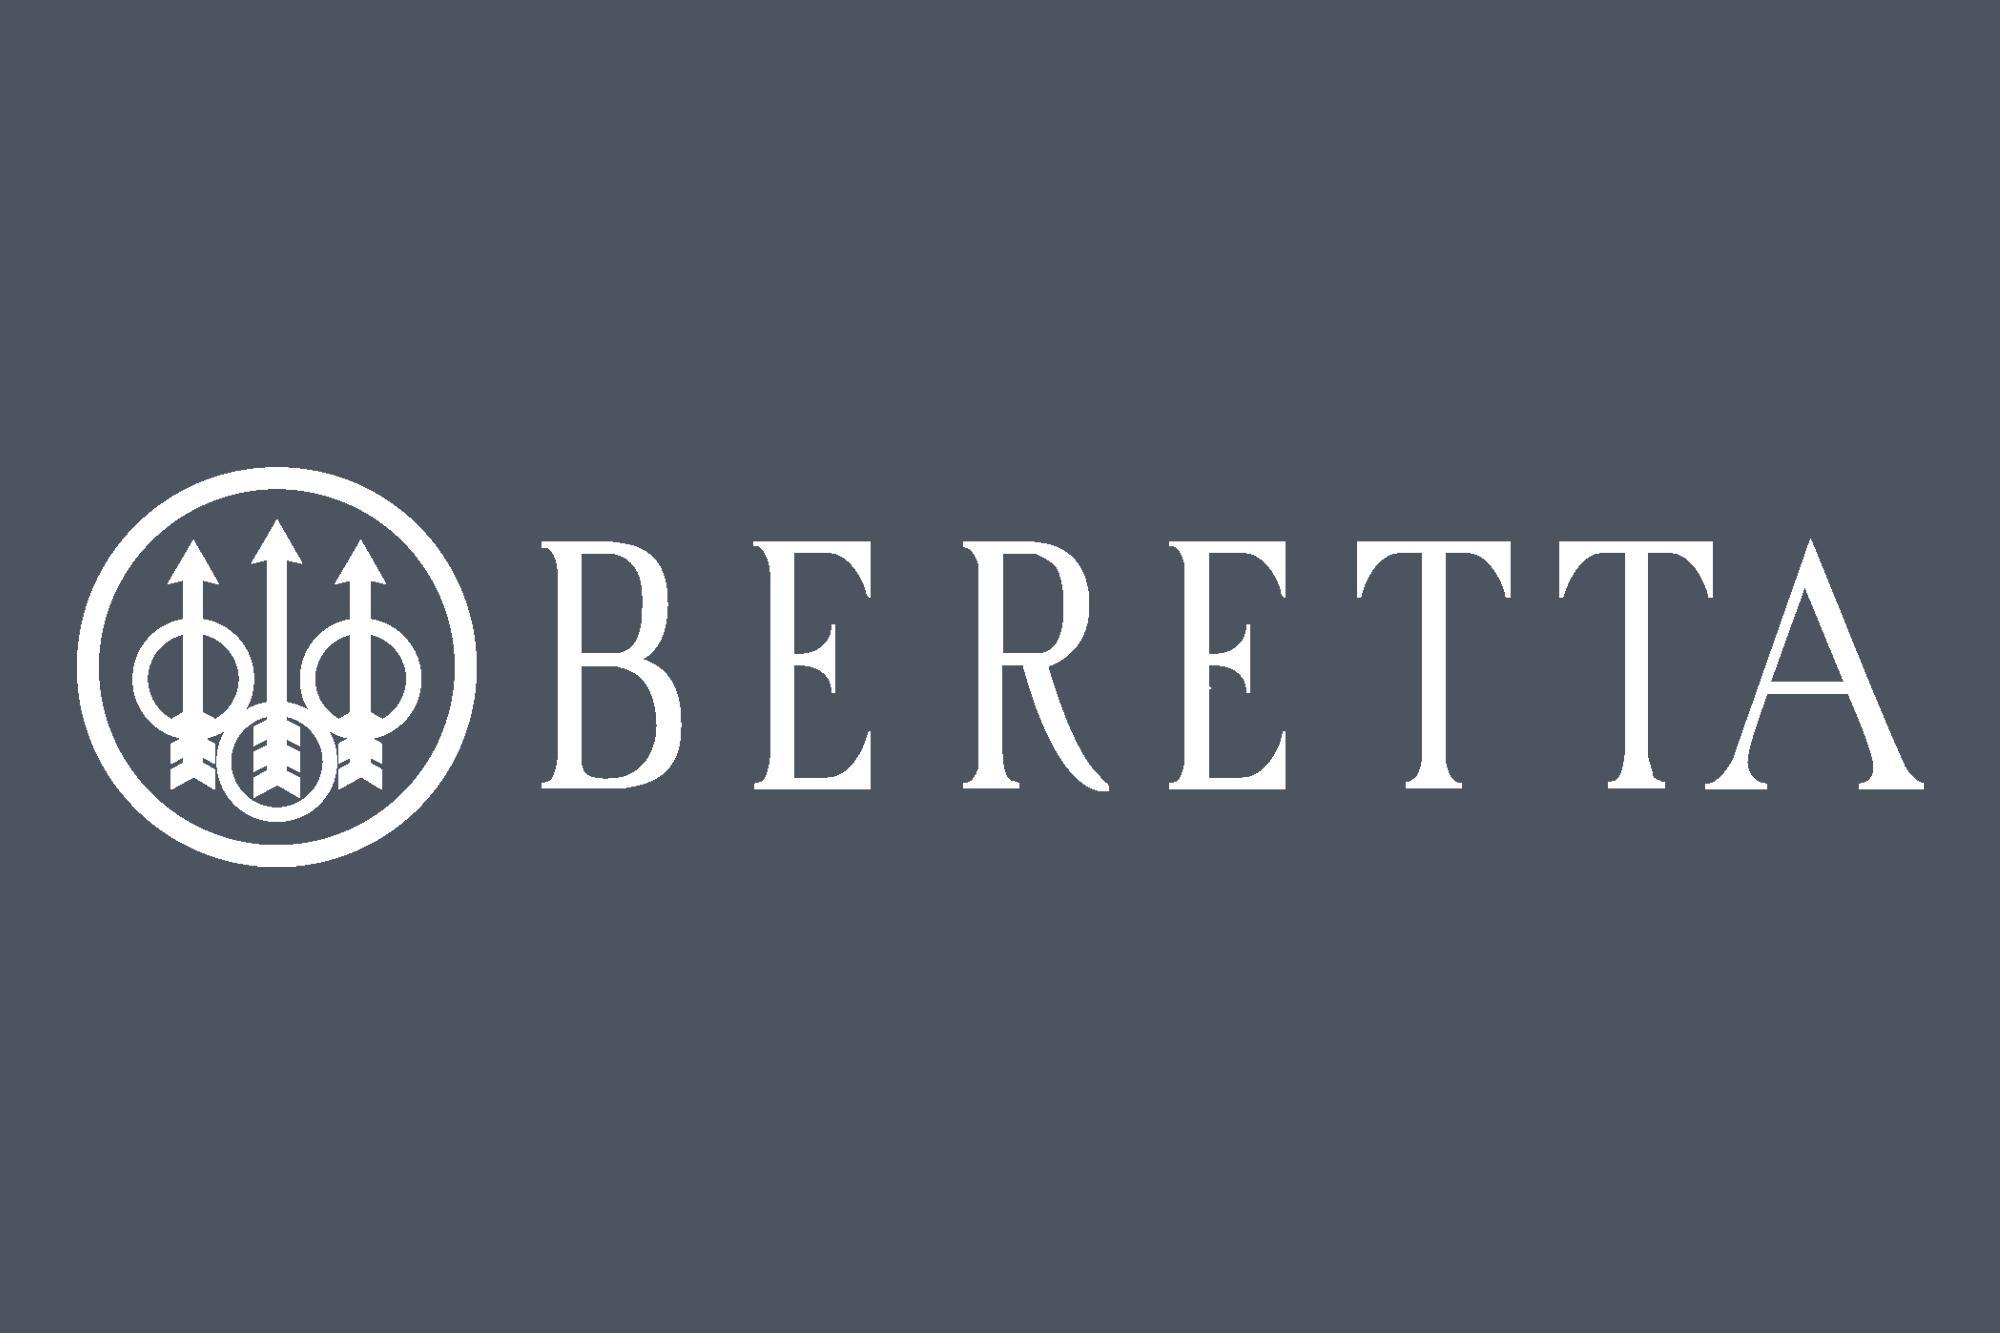 beretta-web.png